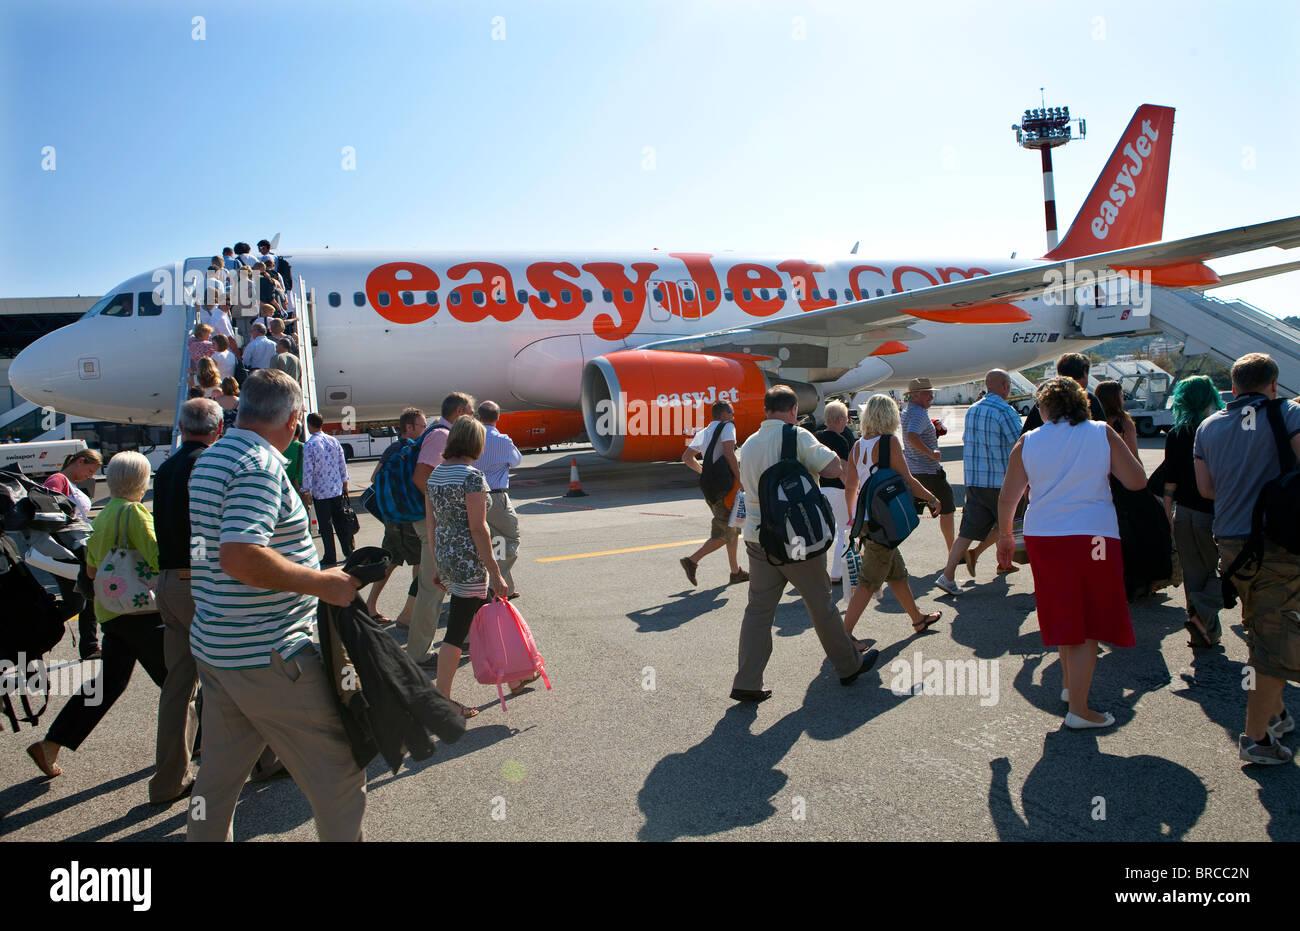 Passengers board an EasyJet flight at Corfu airport. - Stock Image